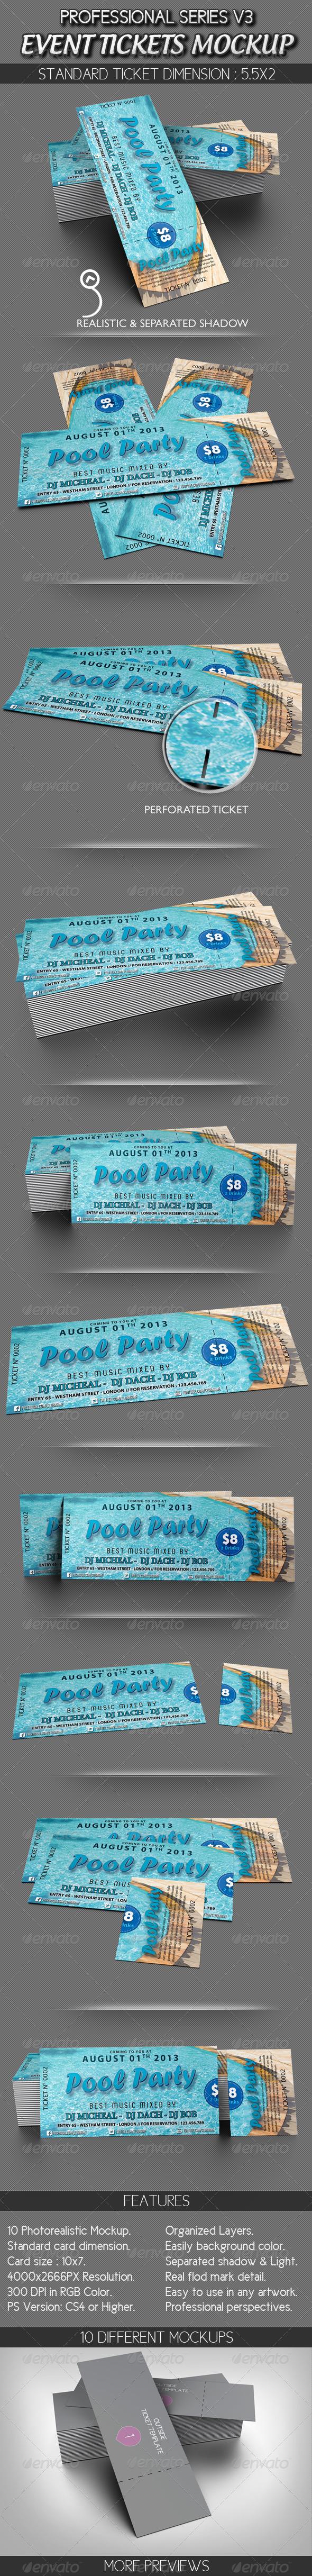 GraphicRiver Event Tickets Mockup 2858558